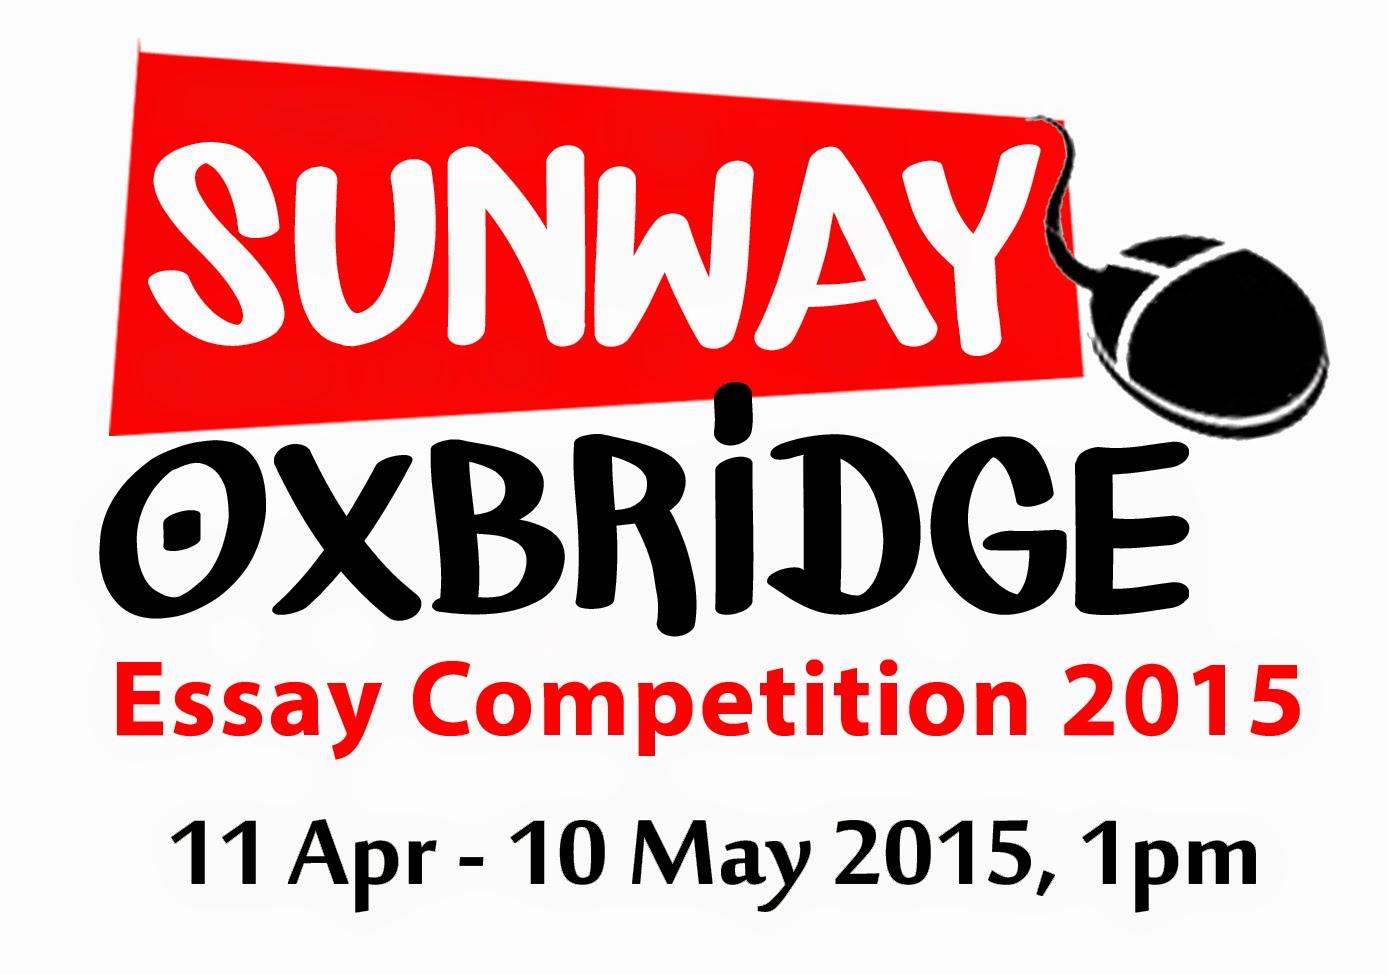 Pertandingan Esei Sunway Oxbridge 2015 Kembali!